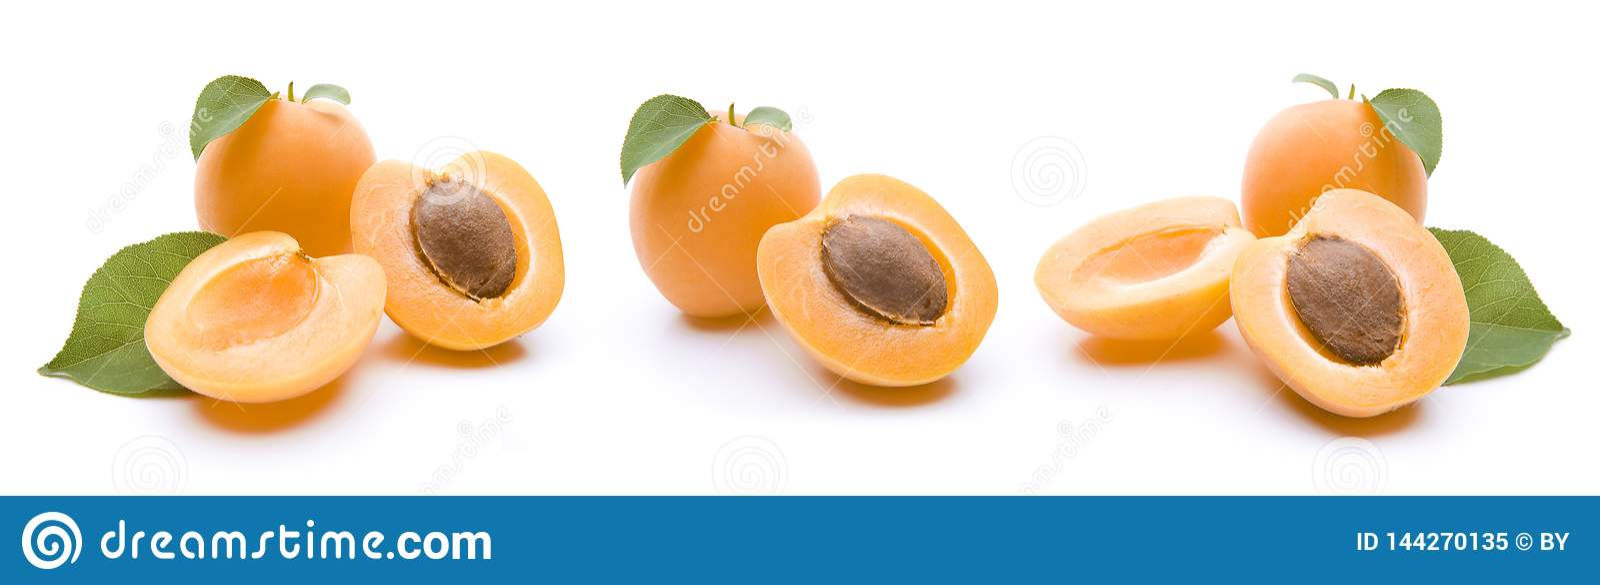 Isolerade aprikosar